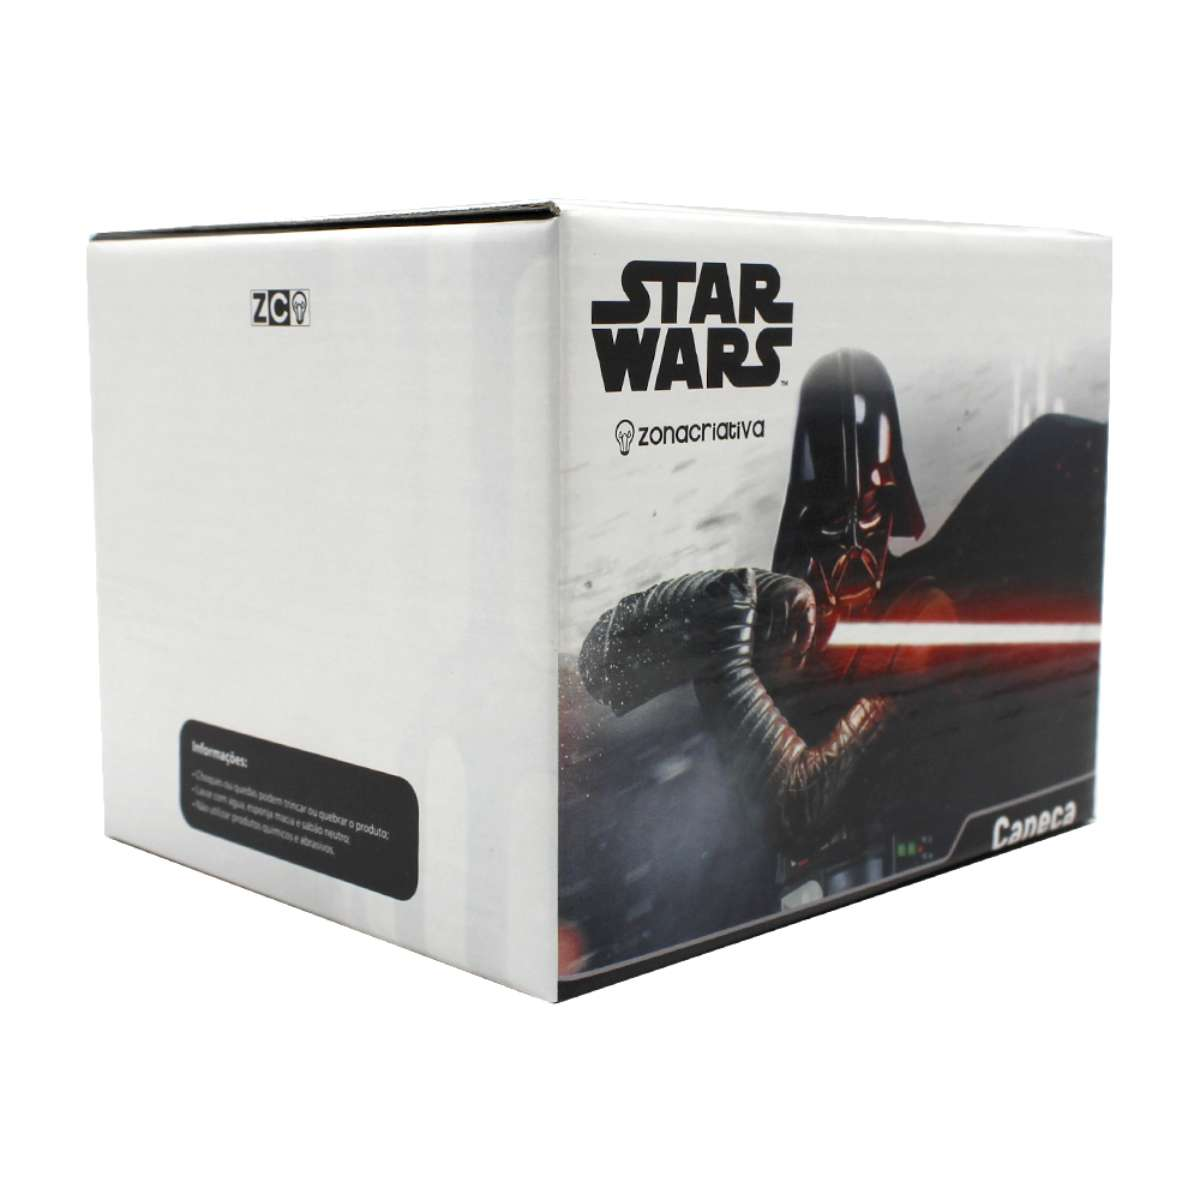 Caneca 3D Formato Stormtrooper Star Wars 500 ml